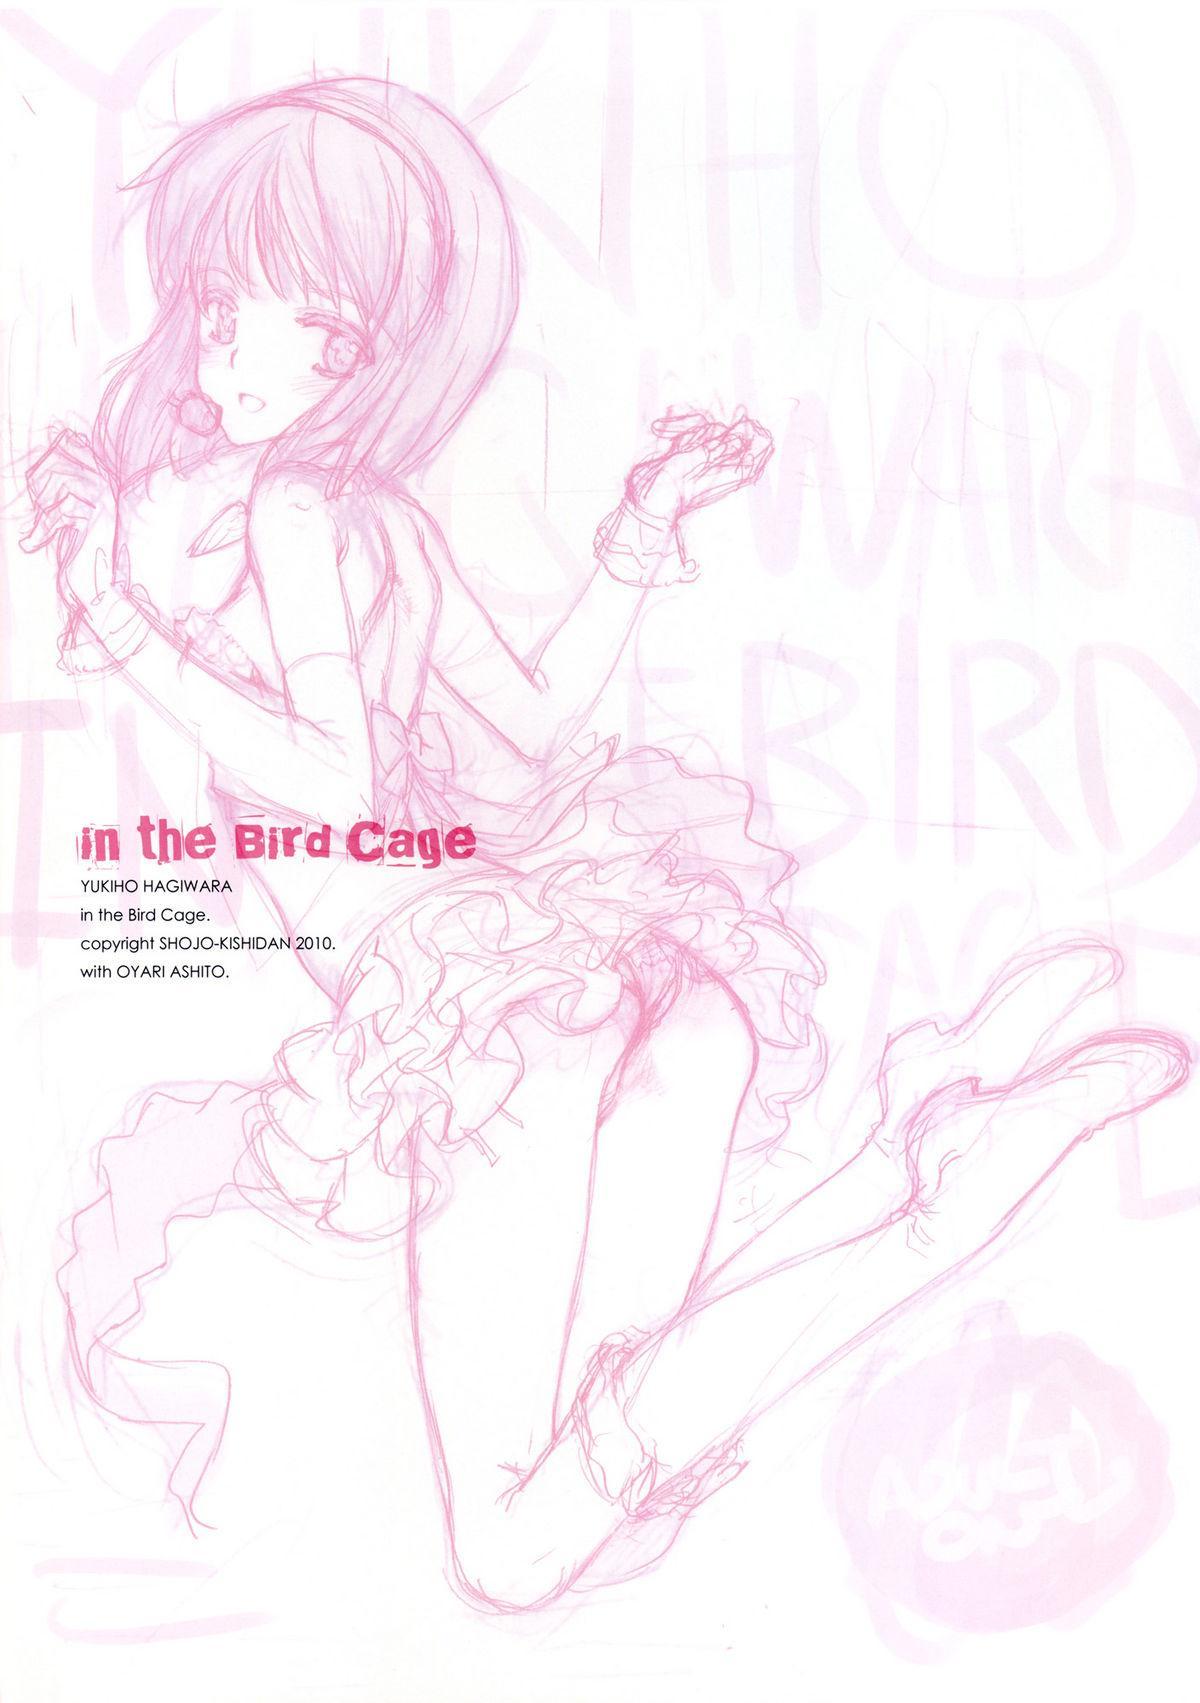 IDOLTIME SPECIAL BOOK YUKIHO HAGIWARA in the Bird Cage 2